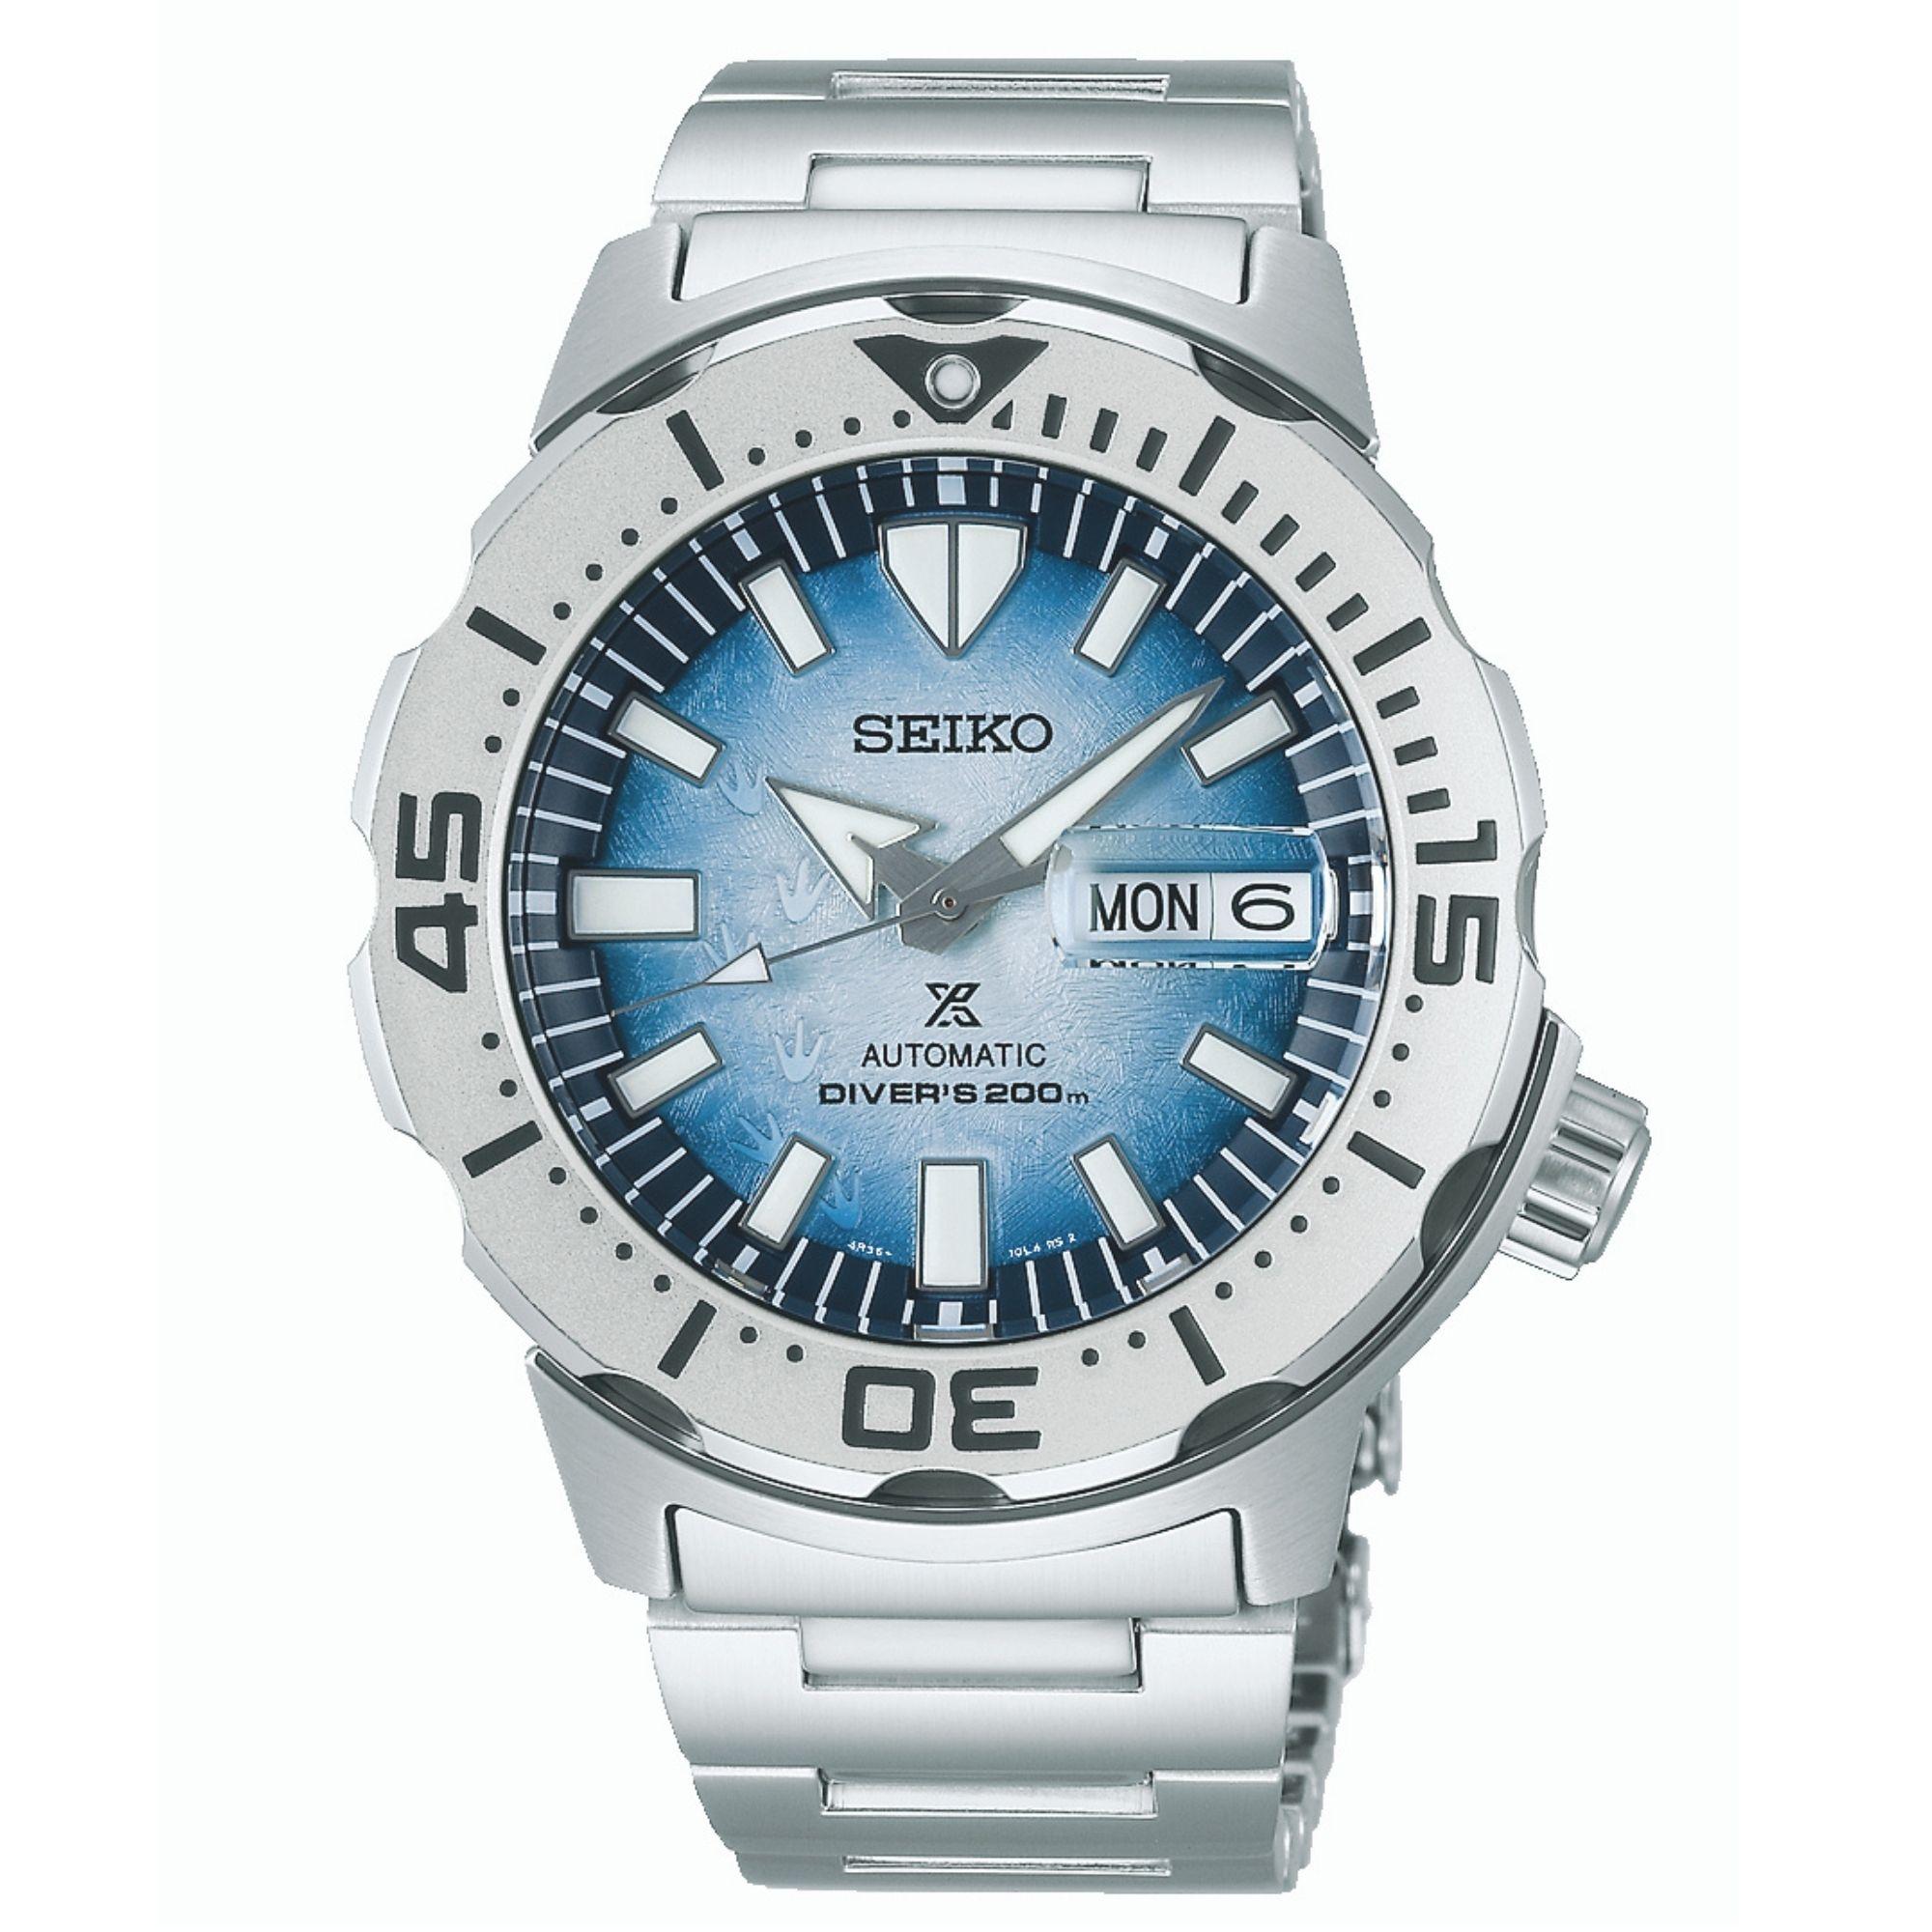 "Seiko Prospex Antarctica Monster ""Save the Ocean"" Automatic Movement Blue Dial Stainless Steel Bracelet SRPG57K1"